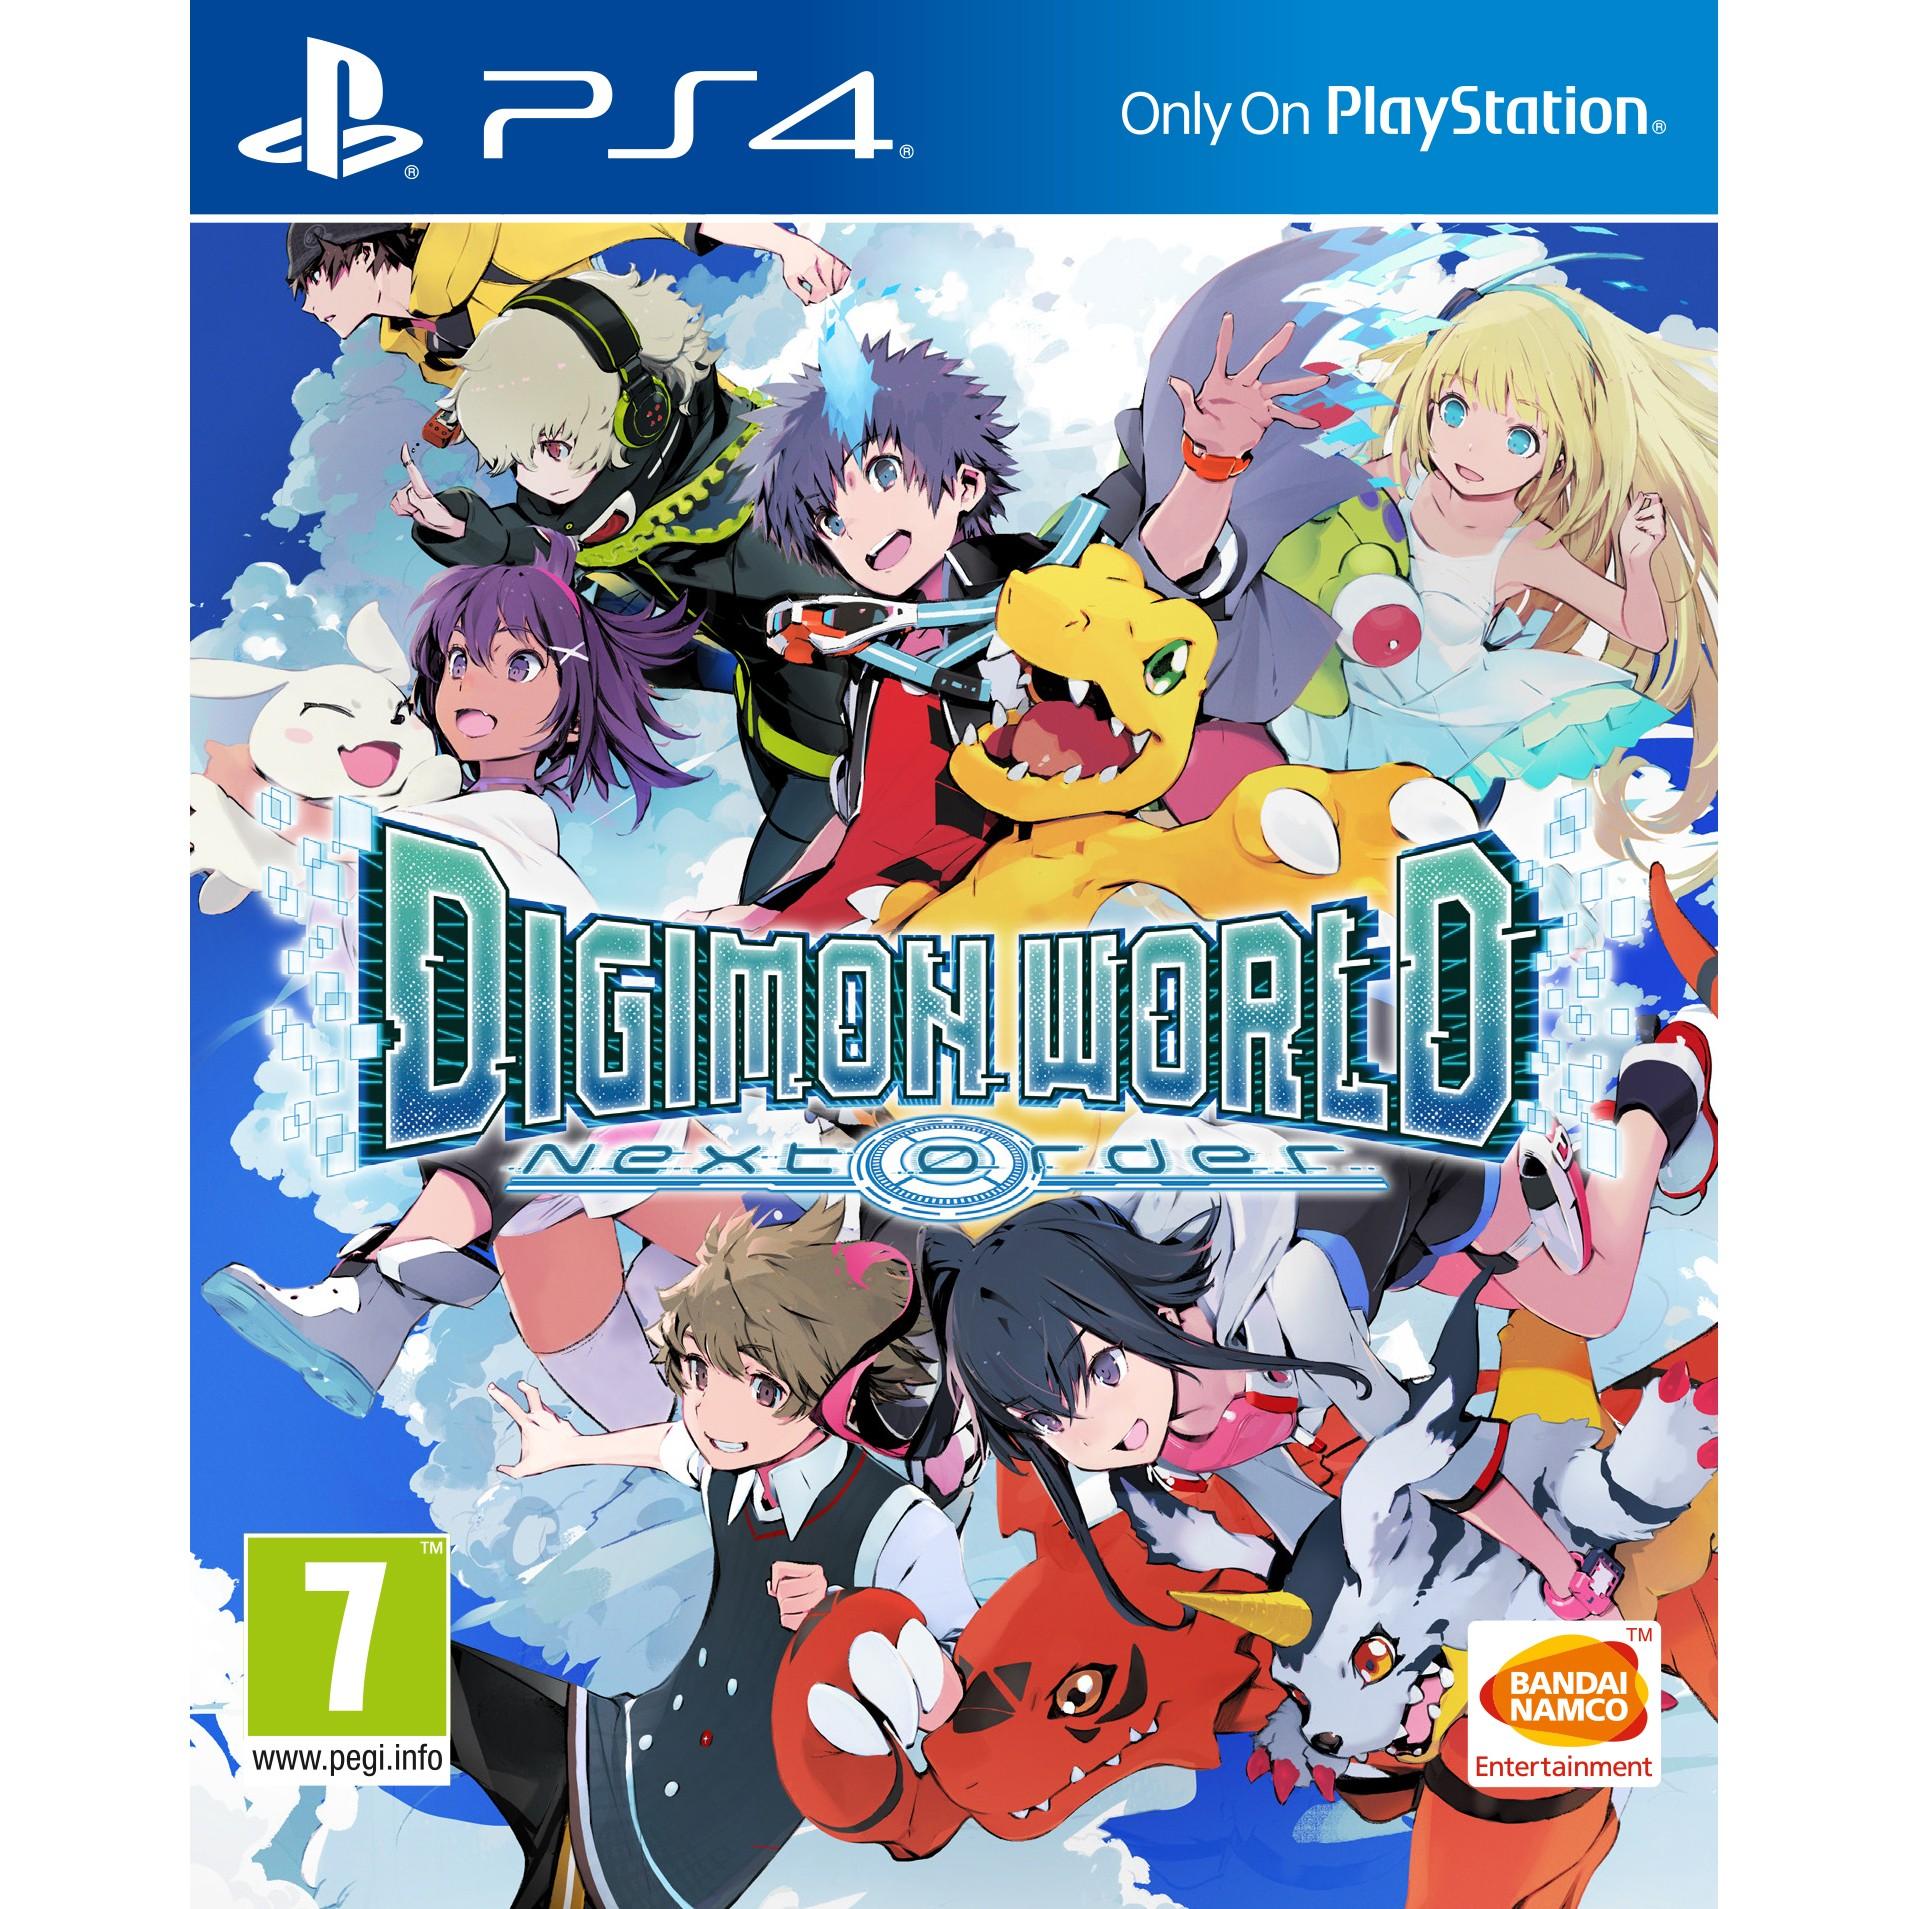 PS4DIGIMONNO : Digimon World: Next Order (PS4)